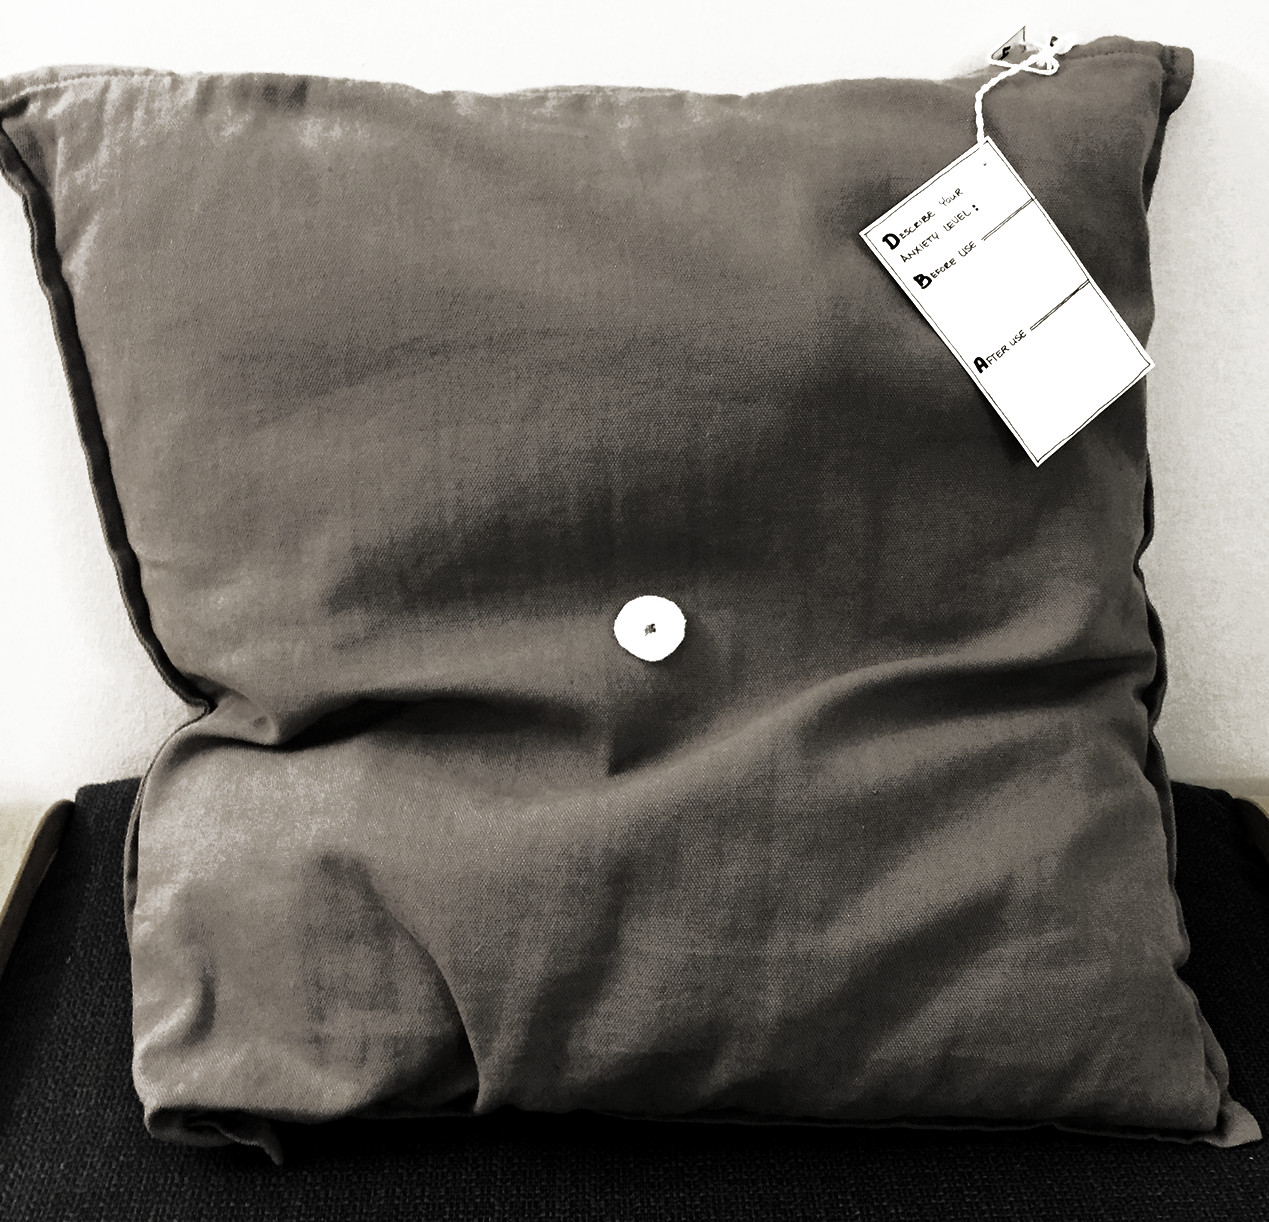 Activity 4: Interactive Pillow